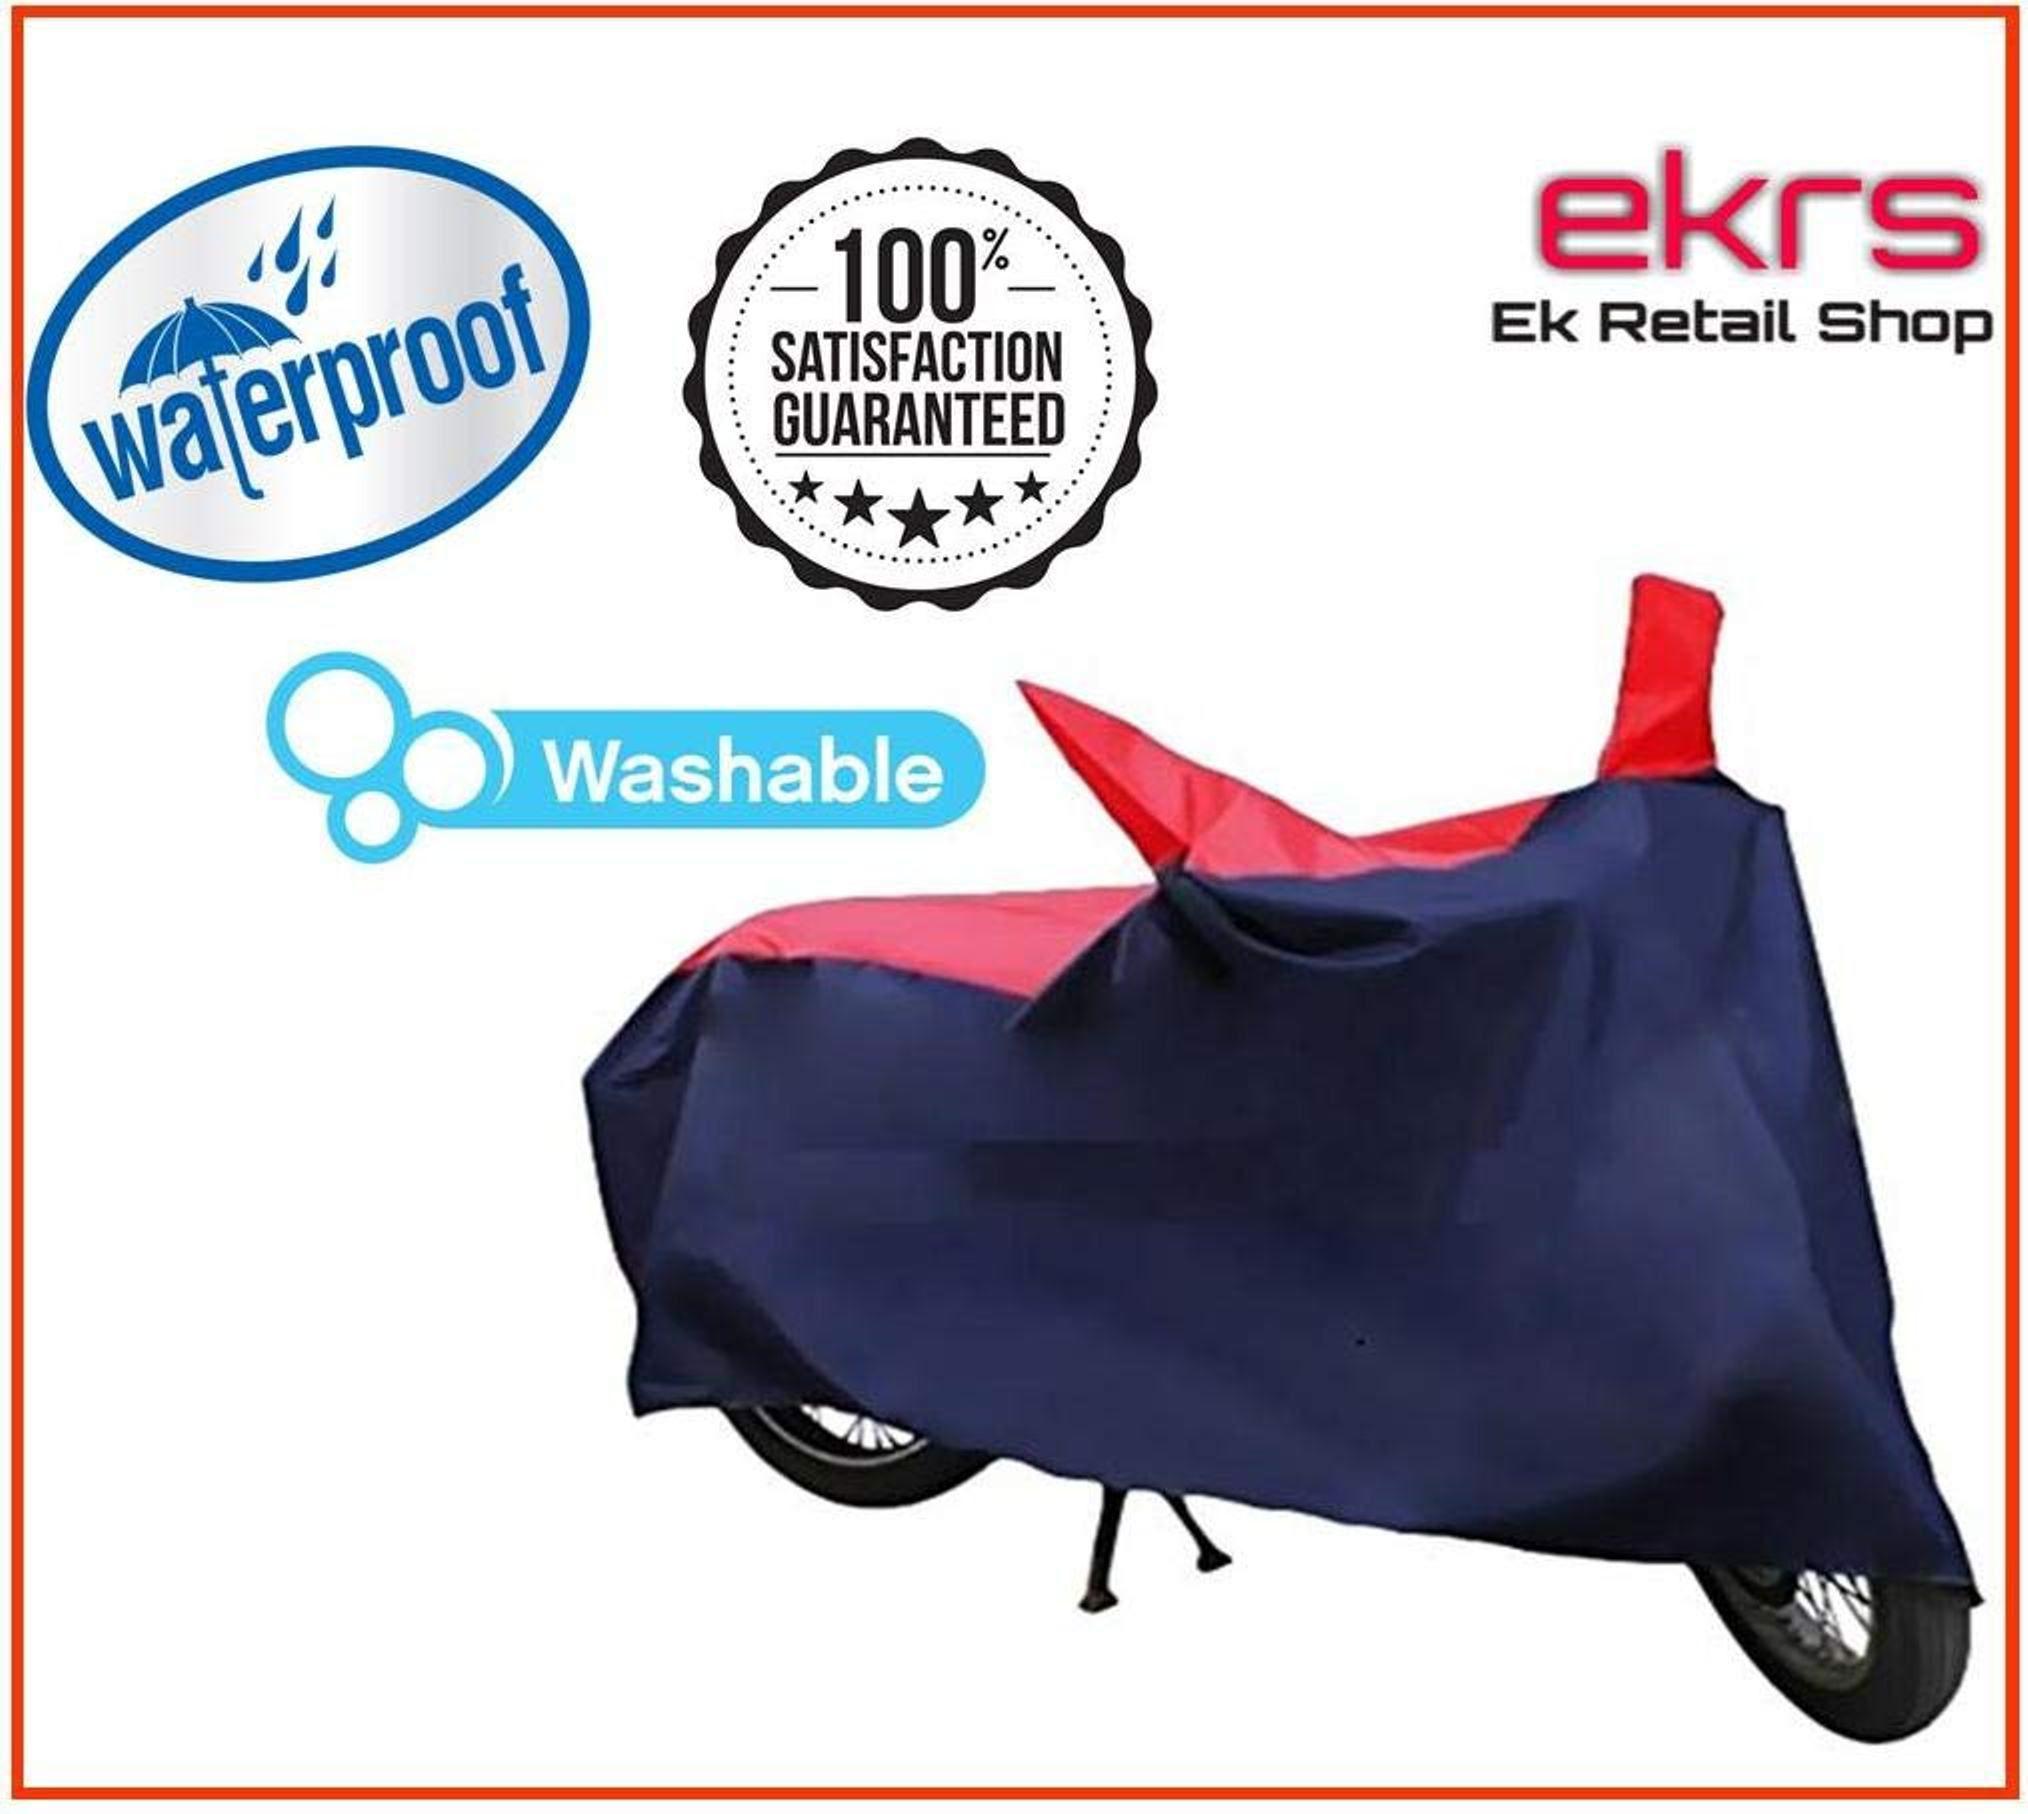 EKRS Nevy/Red Matty Waterproof Bike Body Cover for Harley Davidson Street Bob